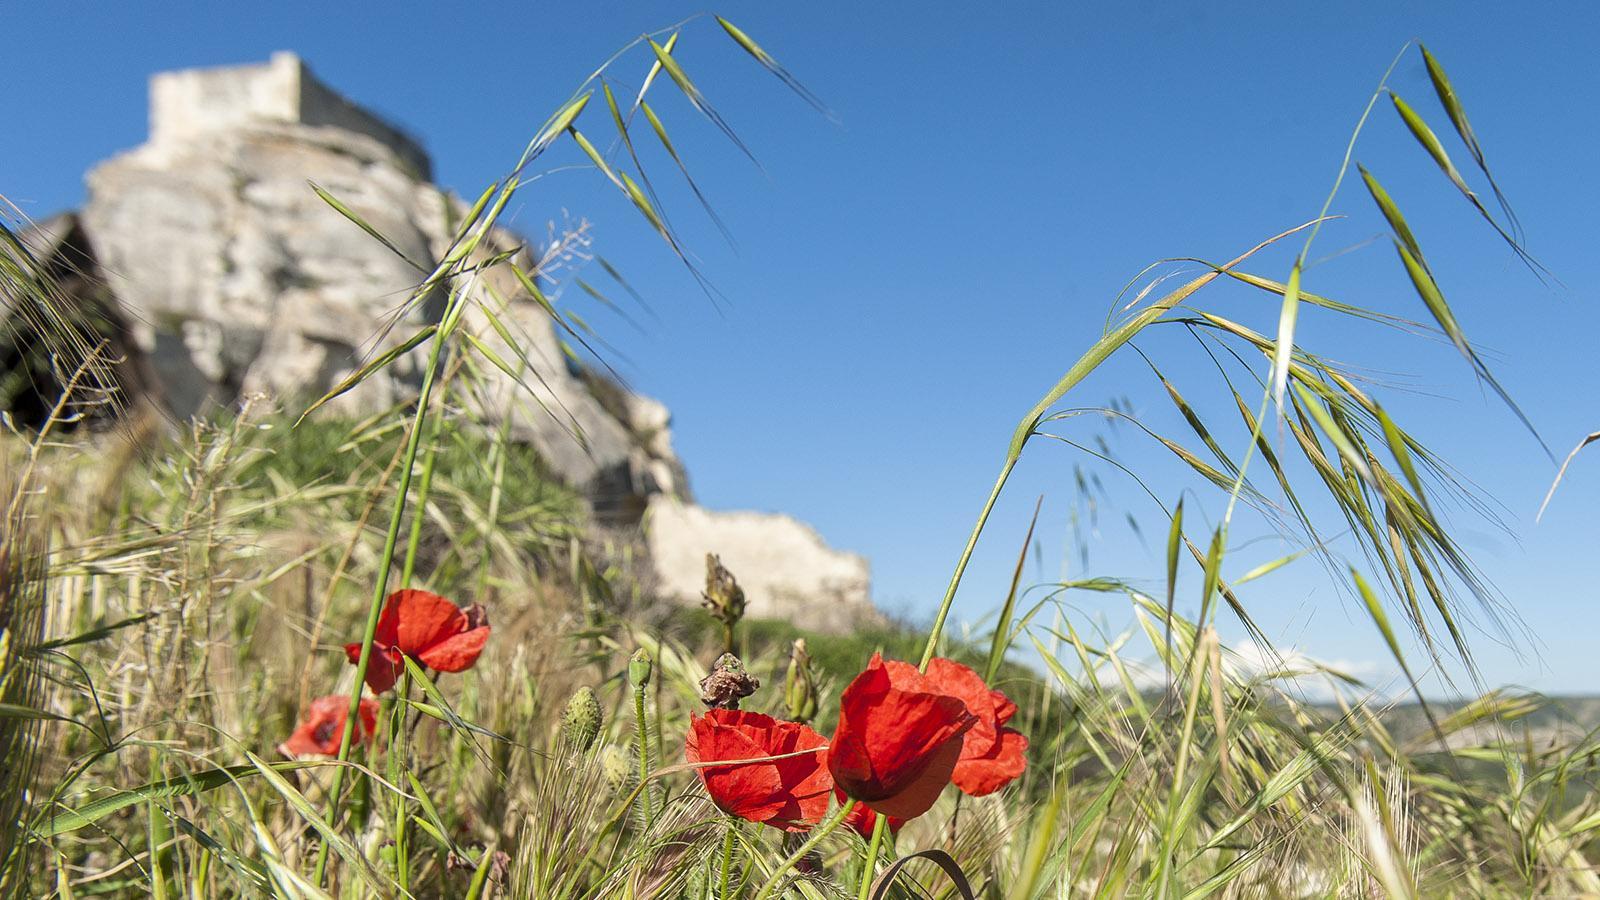 Les Baux-de-Provence: Blick auf die Burg. Foto: Hilke Maunder